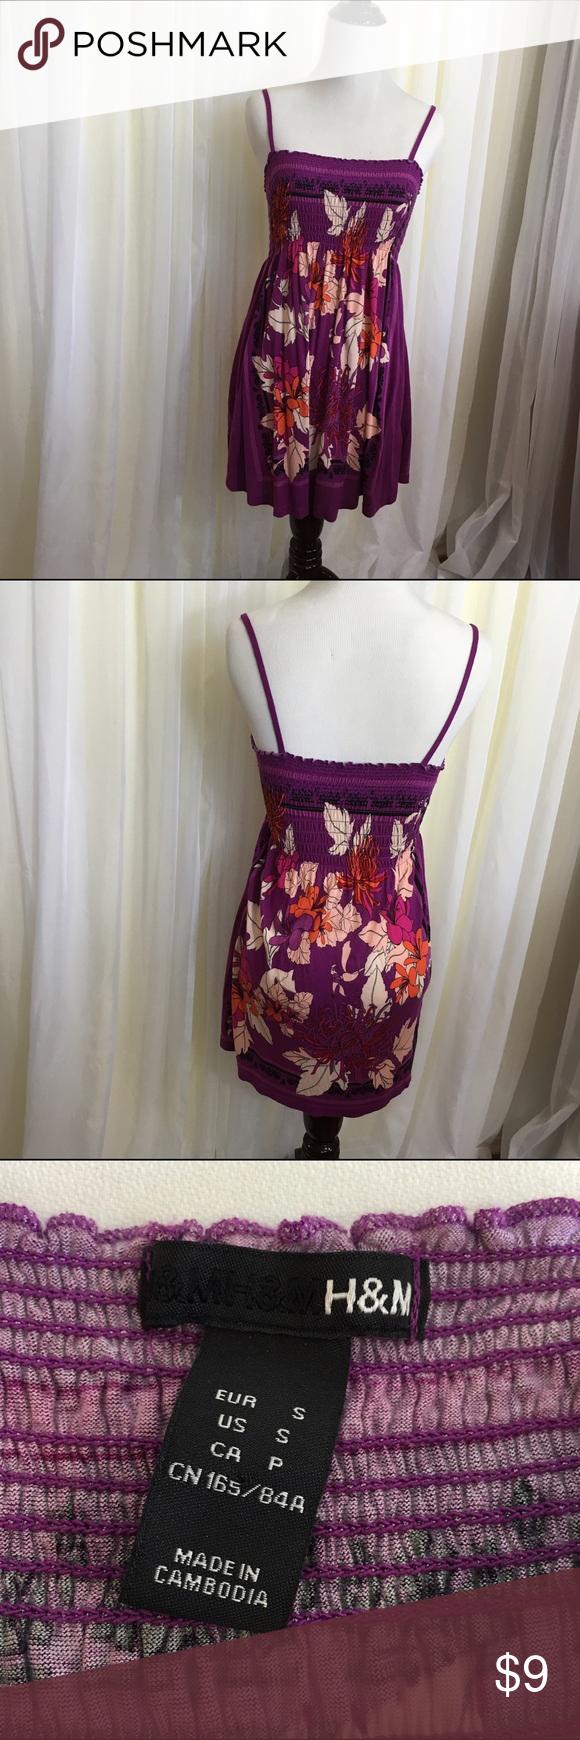 H&M Floral Print 100% Viscose Sundress Soft, flowy floral 100% viscose sundress with smocked top. H&M Dresses Mini